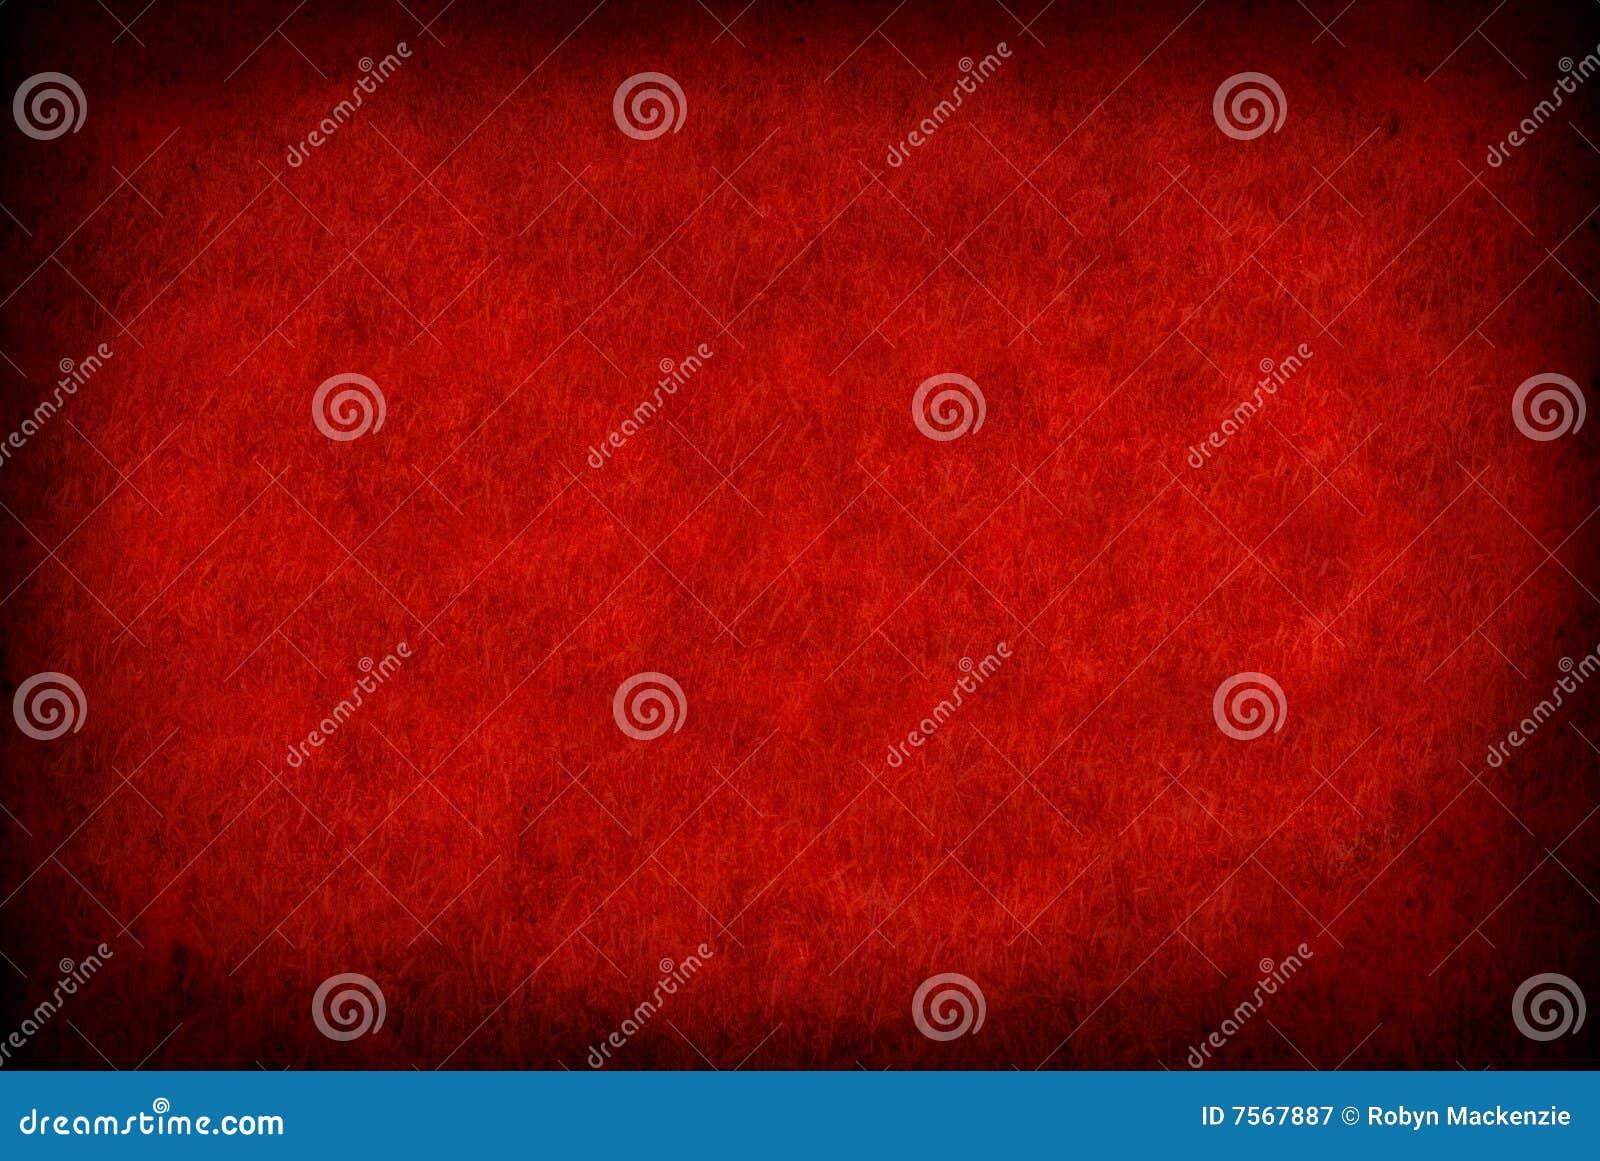 Grunge纸红色